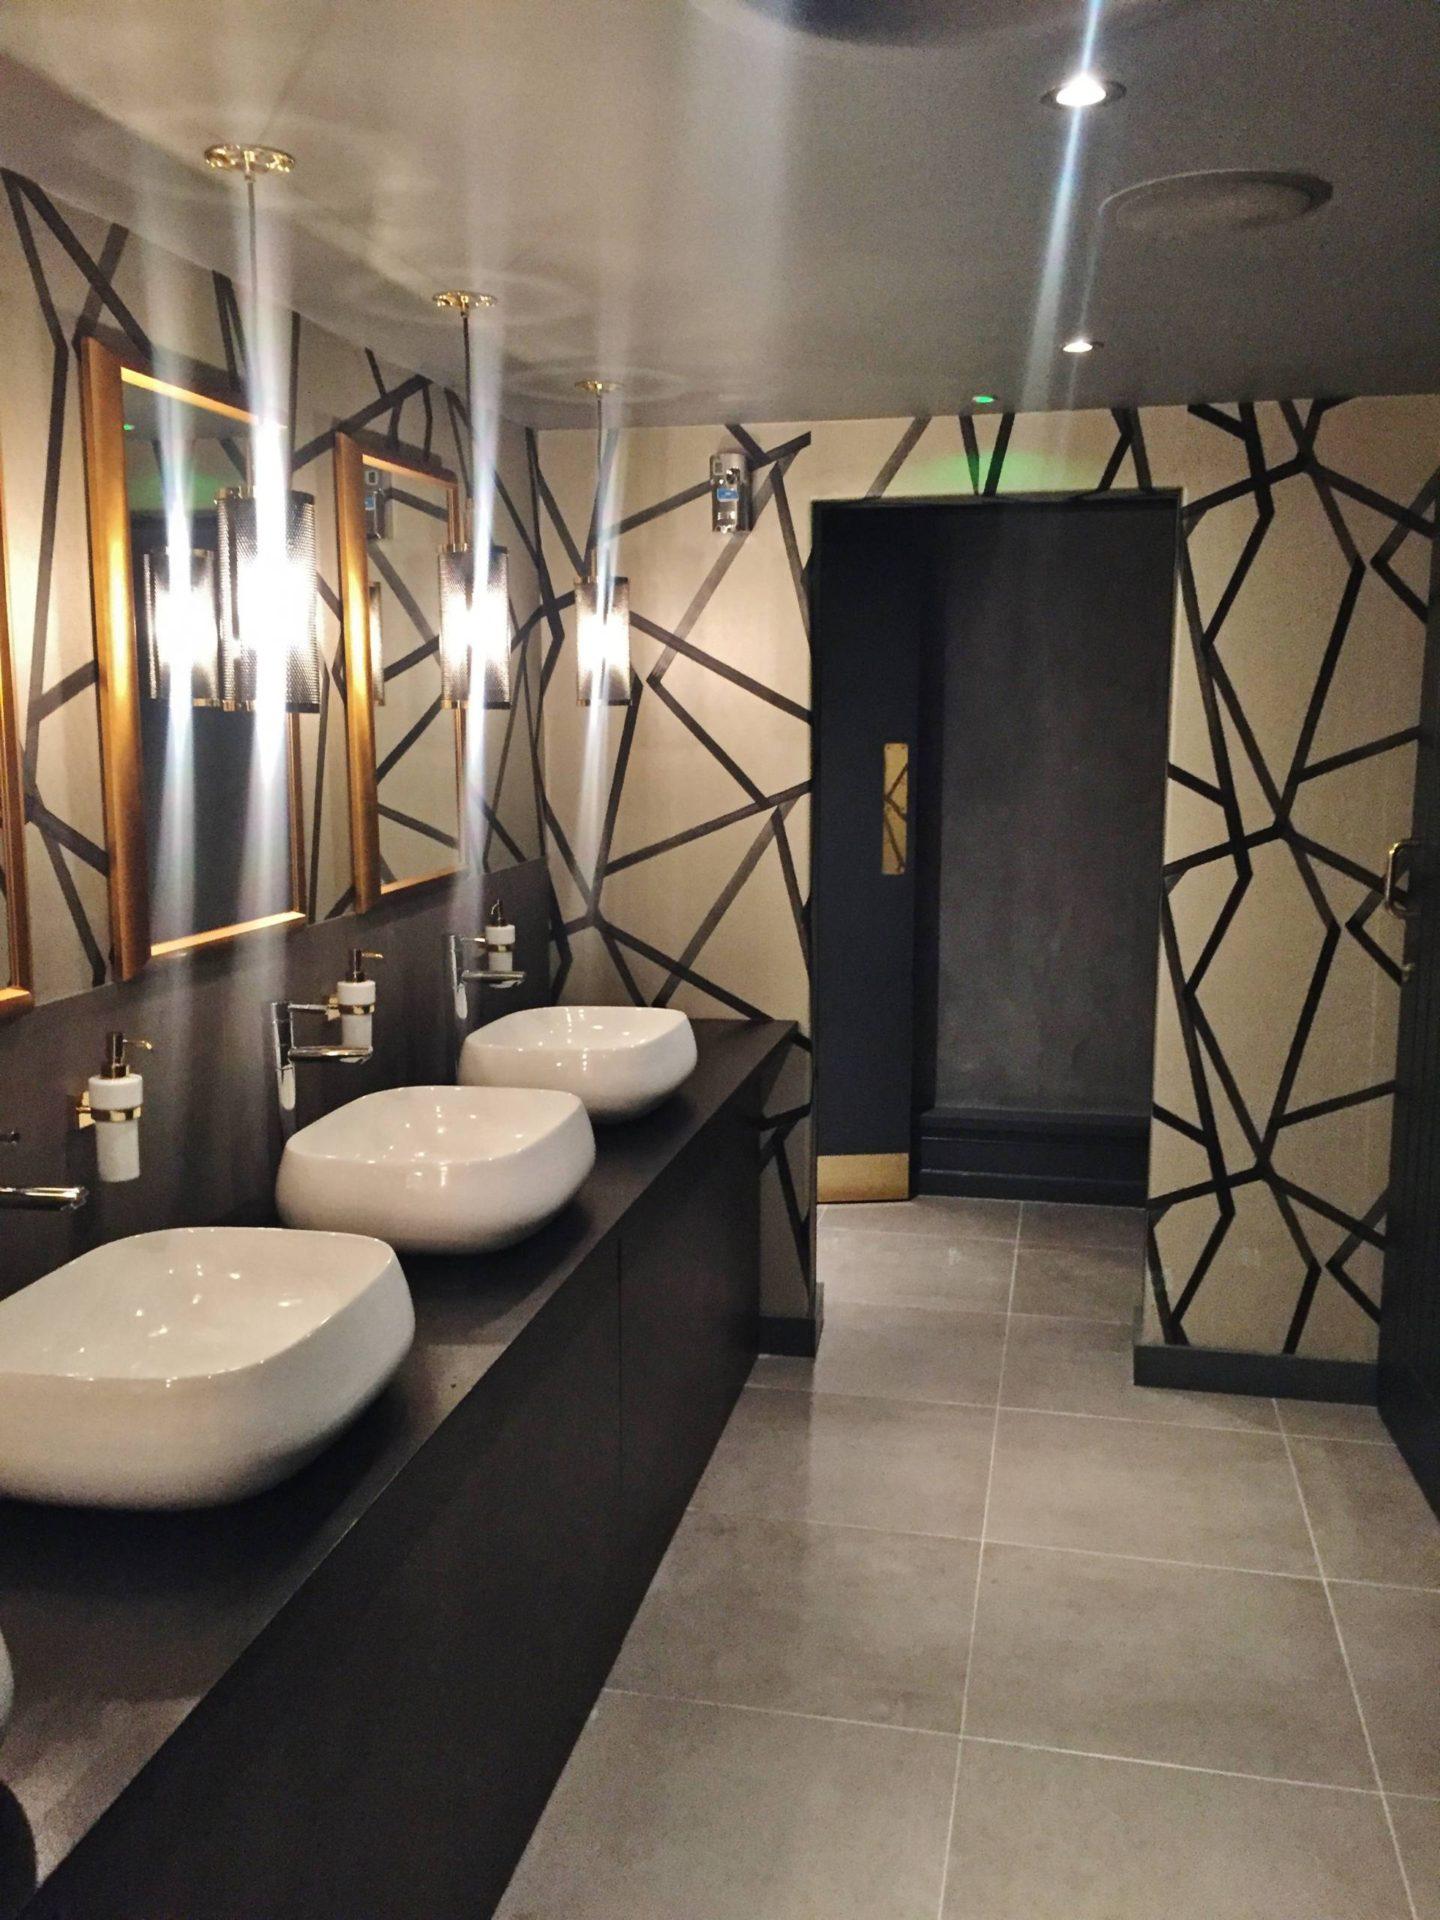 Opheem Toilets Birmingham